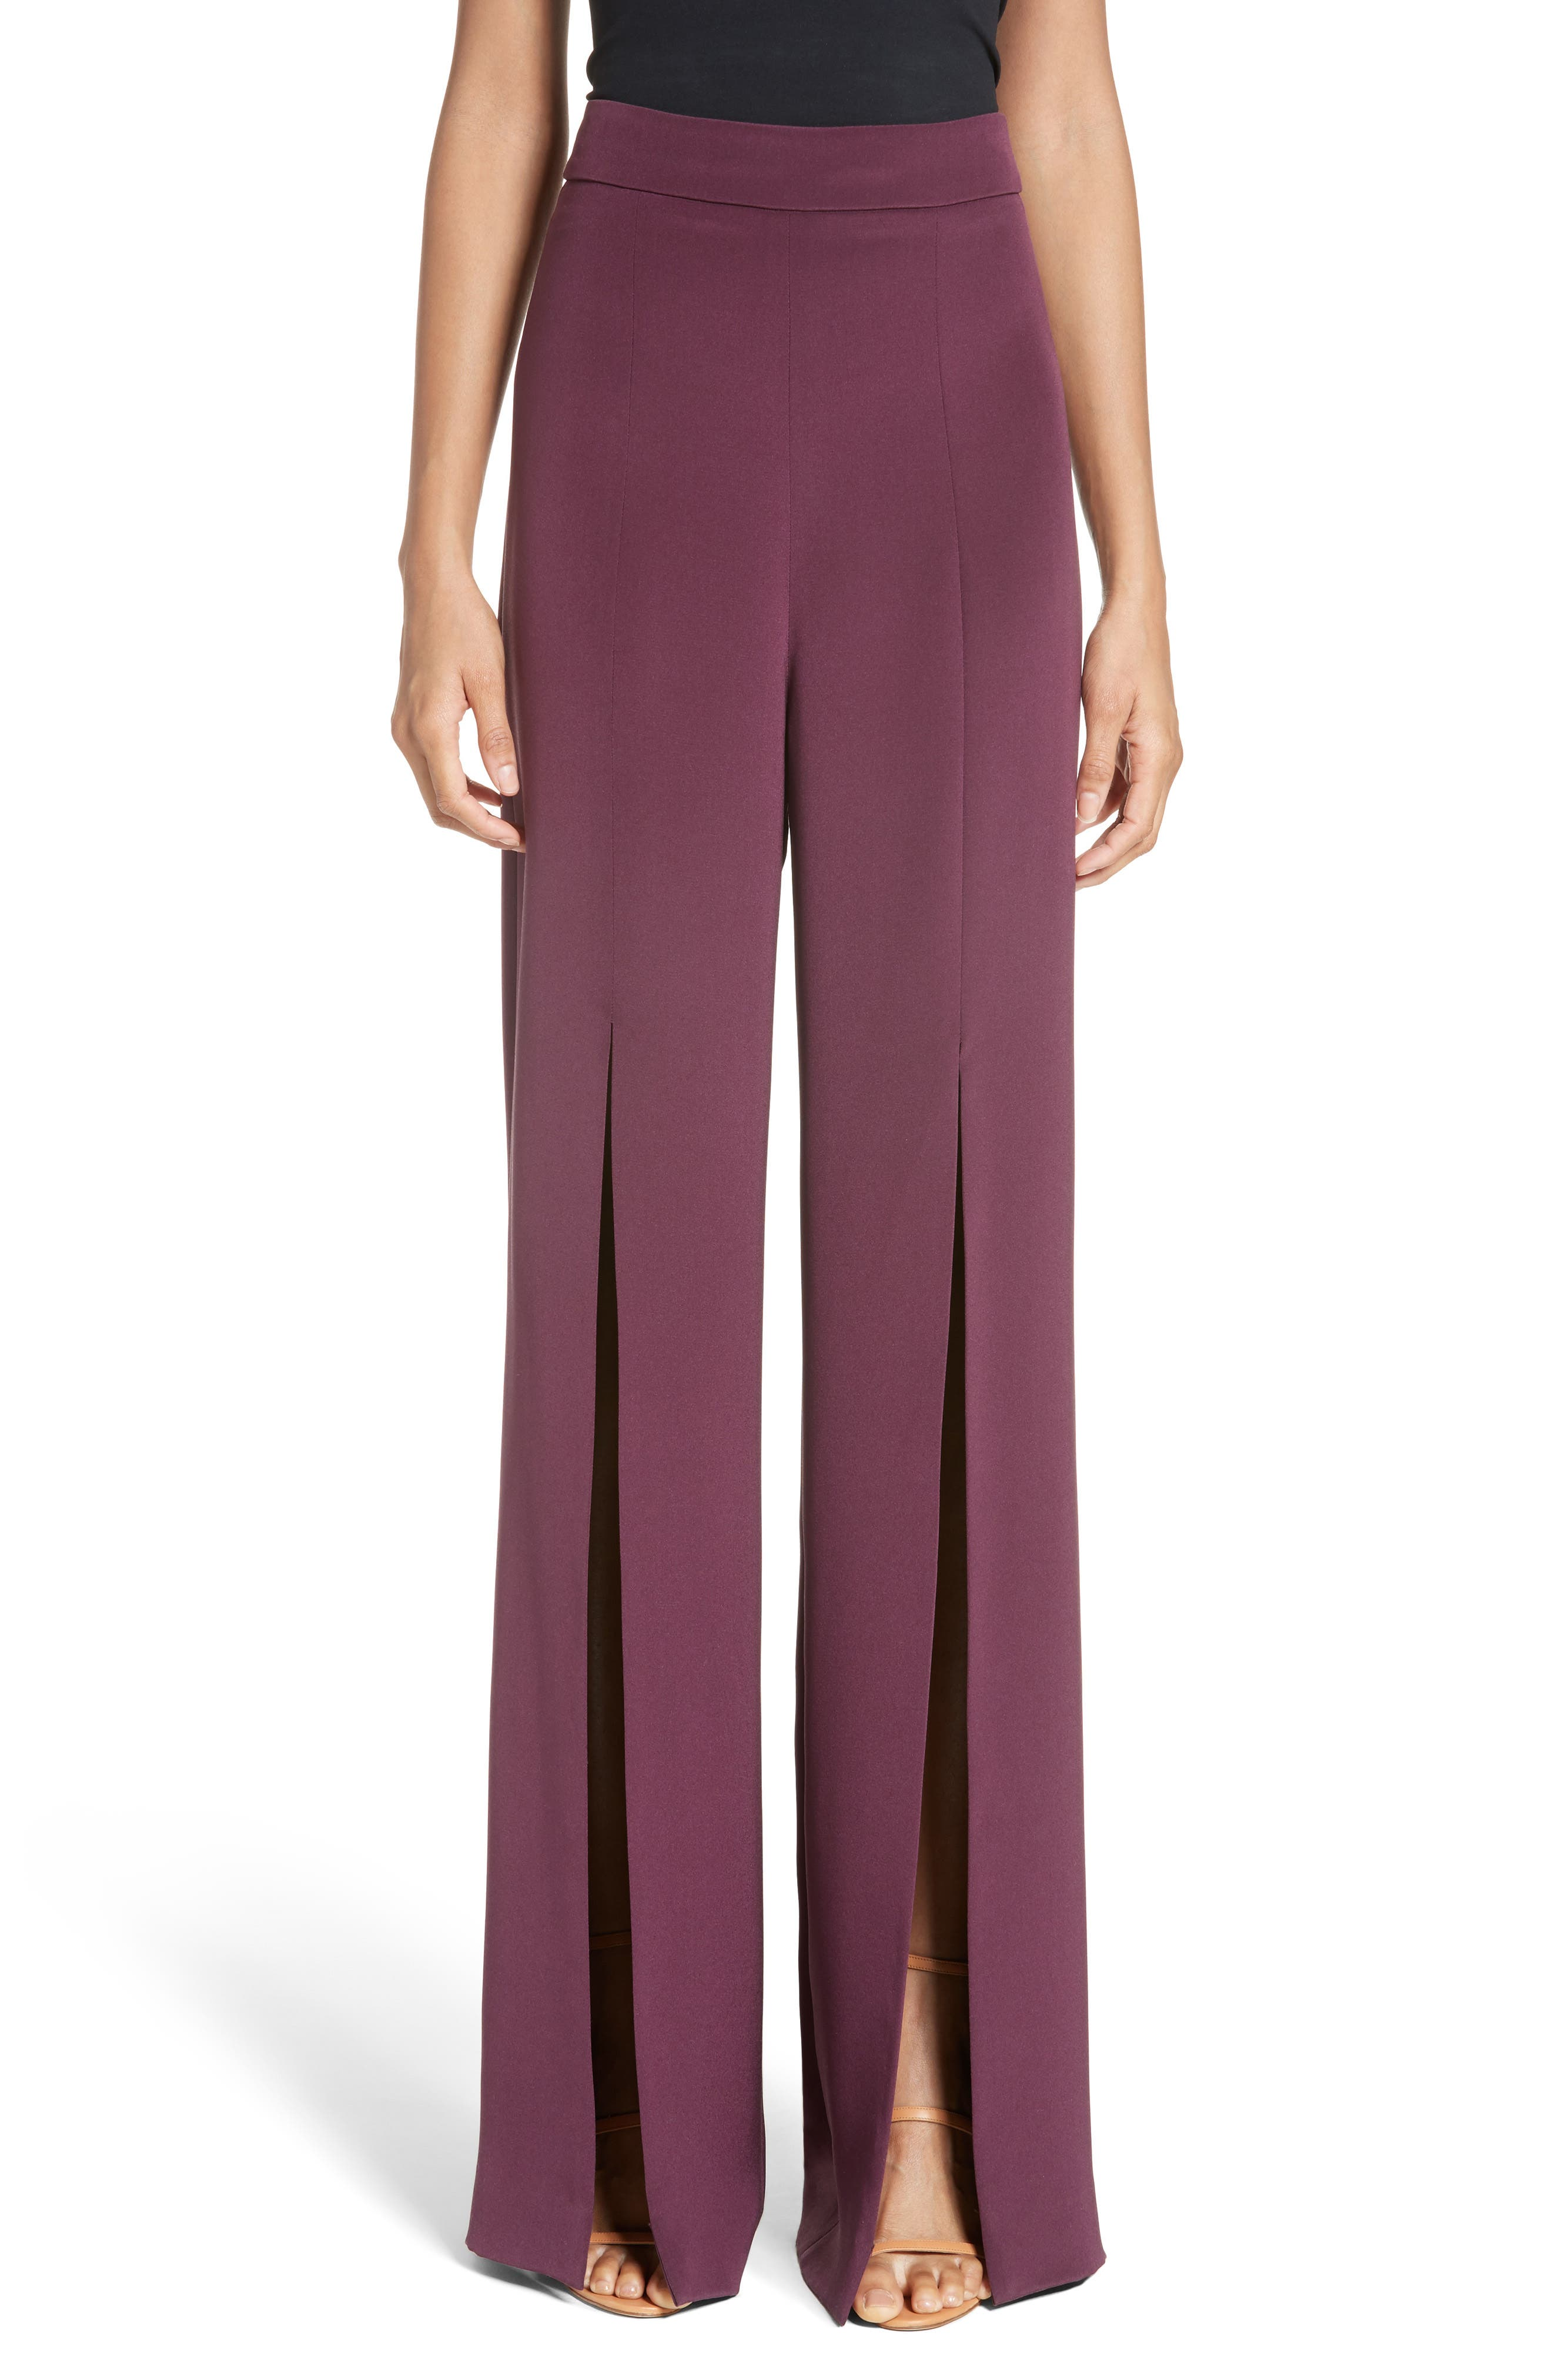 Main Image - Cushnie et Ochs Slit Silk High Waisted Pants